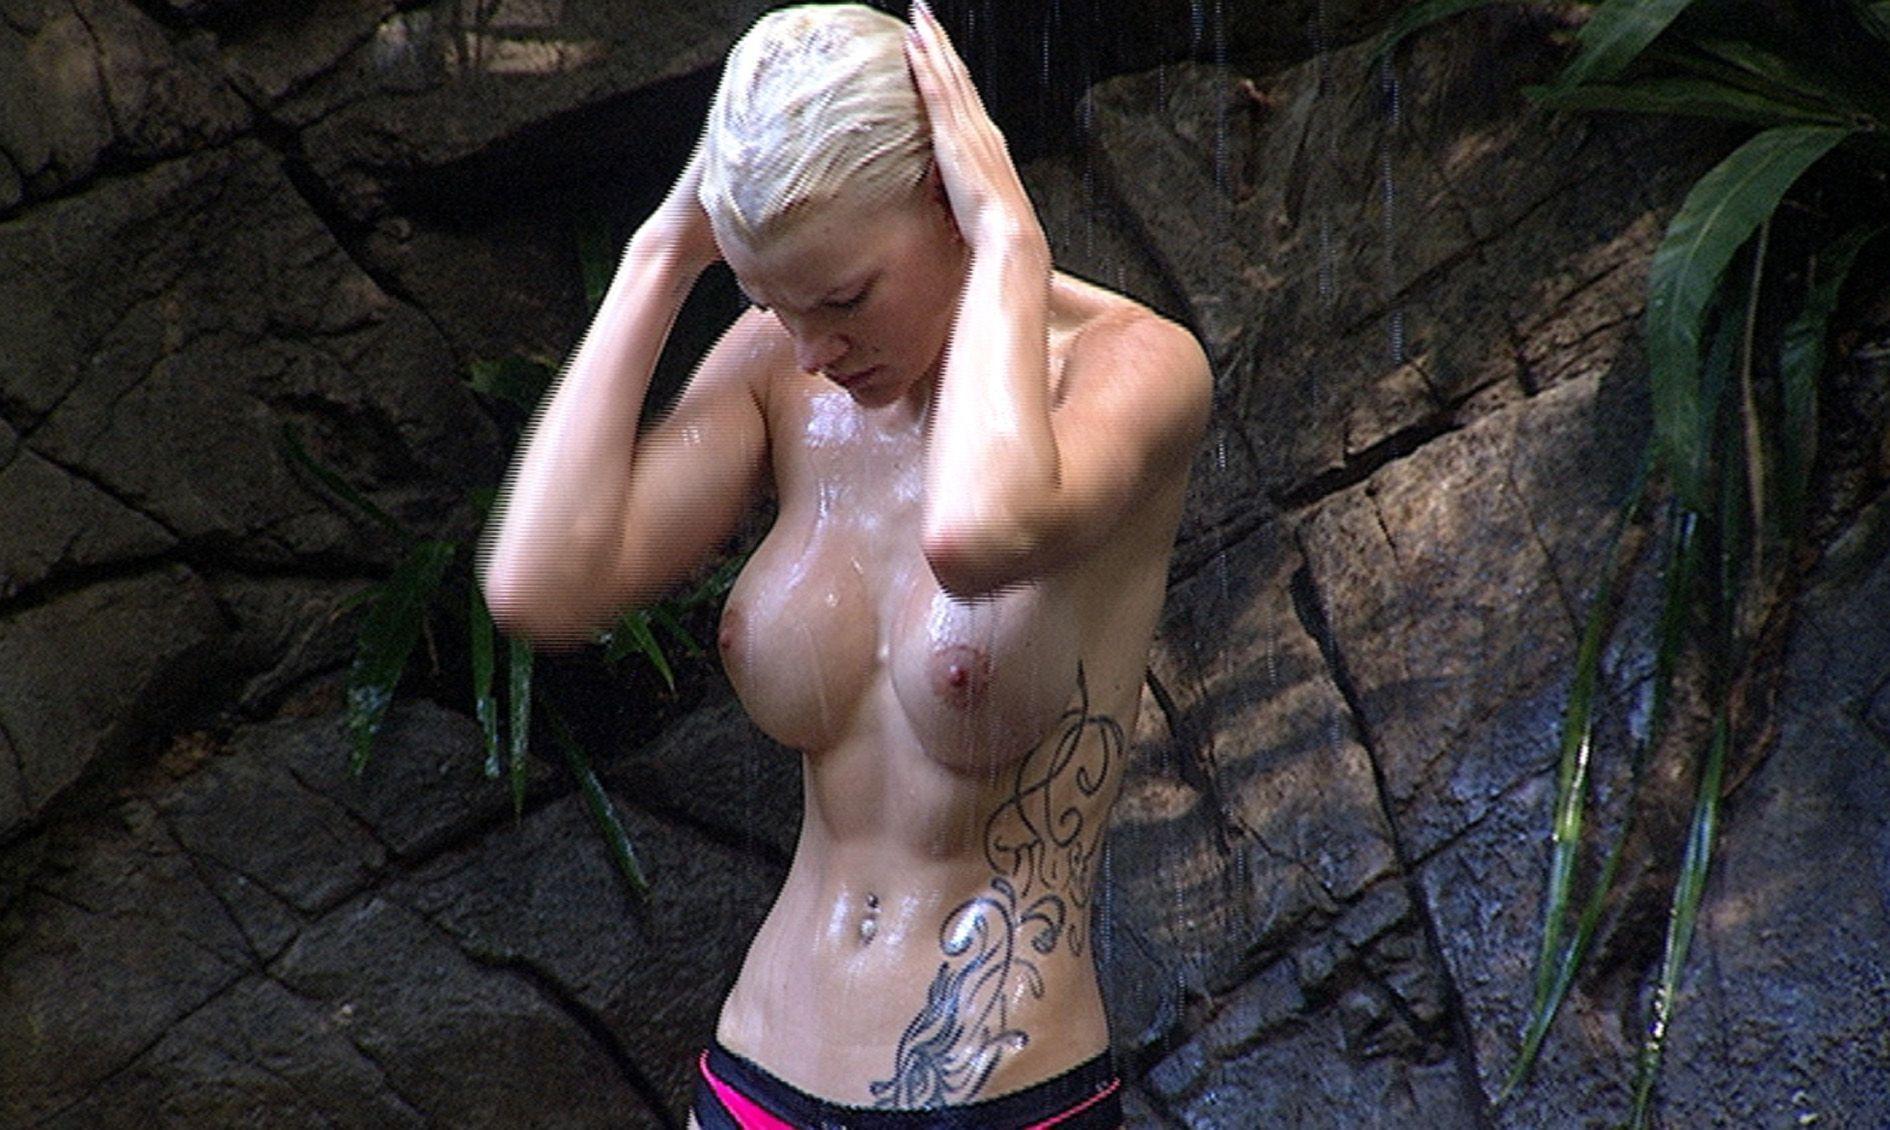 Melanie müller nackt video